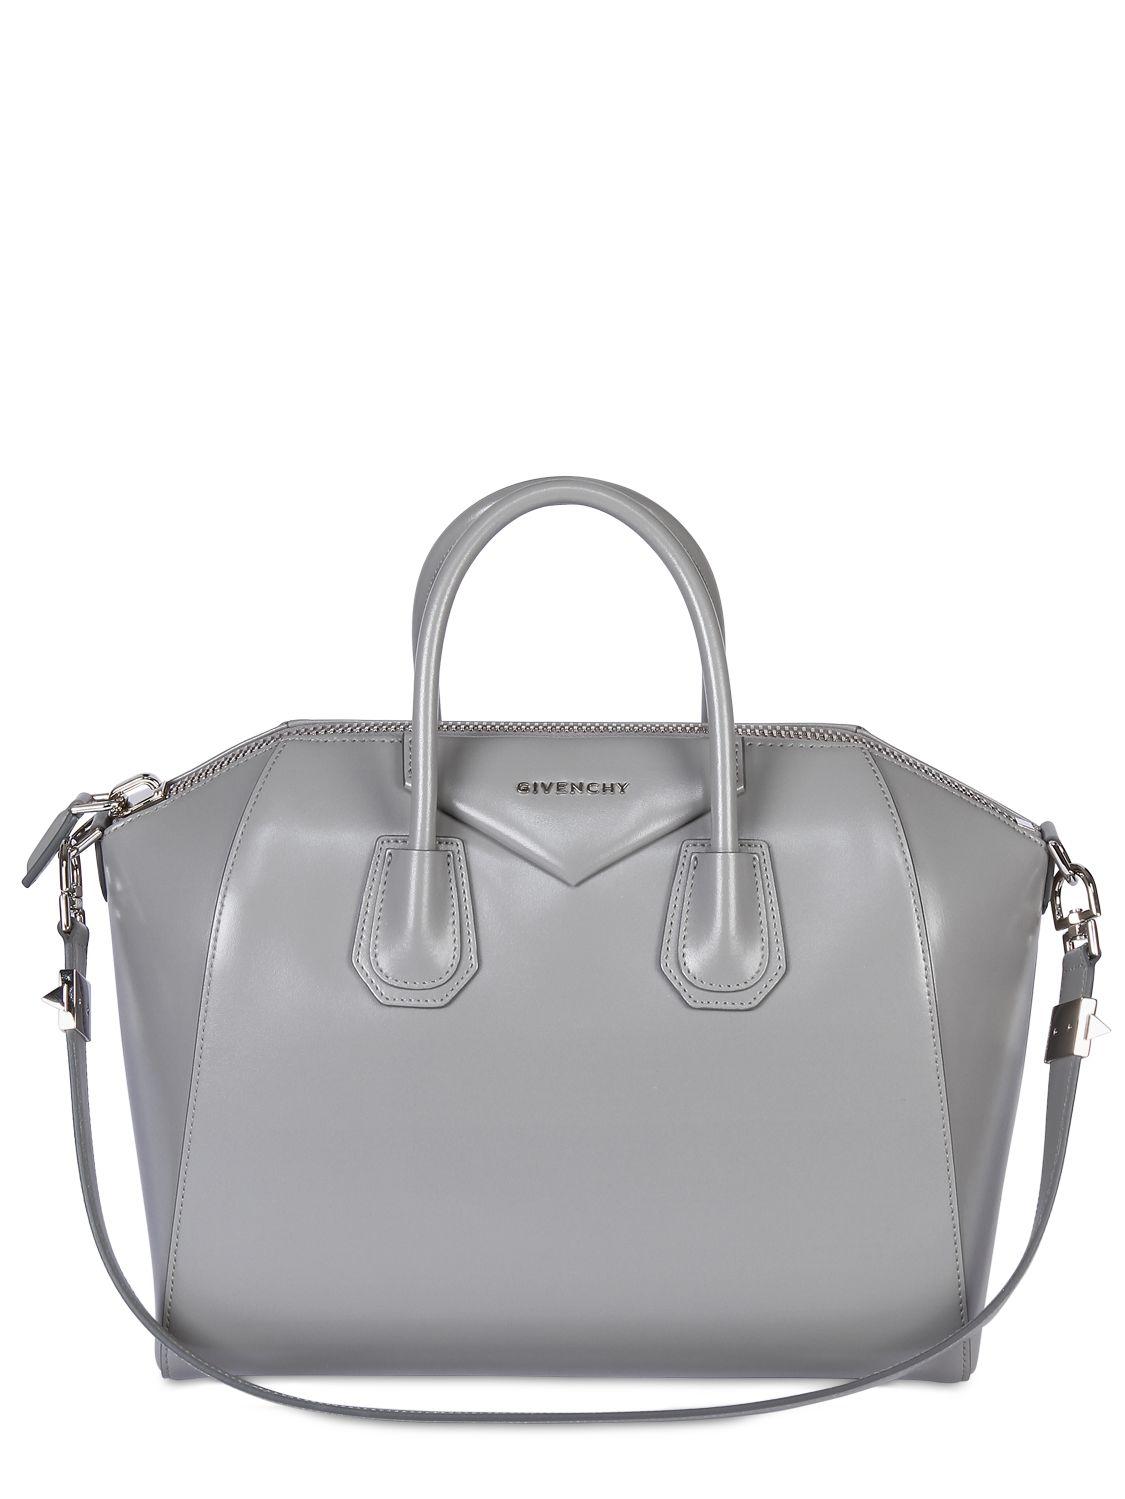 e9f3630387a3 Lyst - Givenchy Medium Antigona Shiny Smooth Leather Bag in Gray